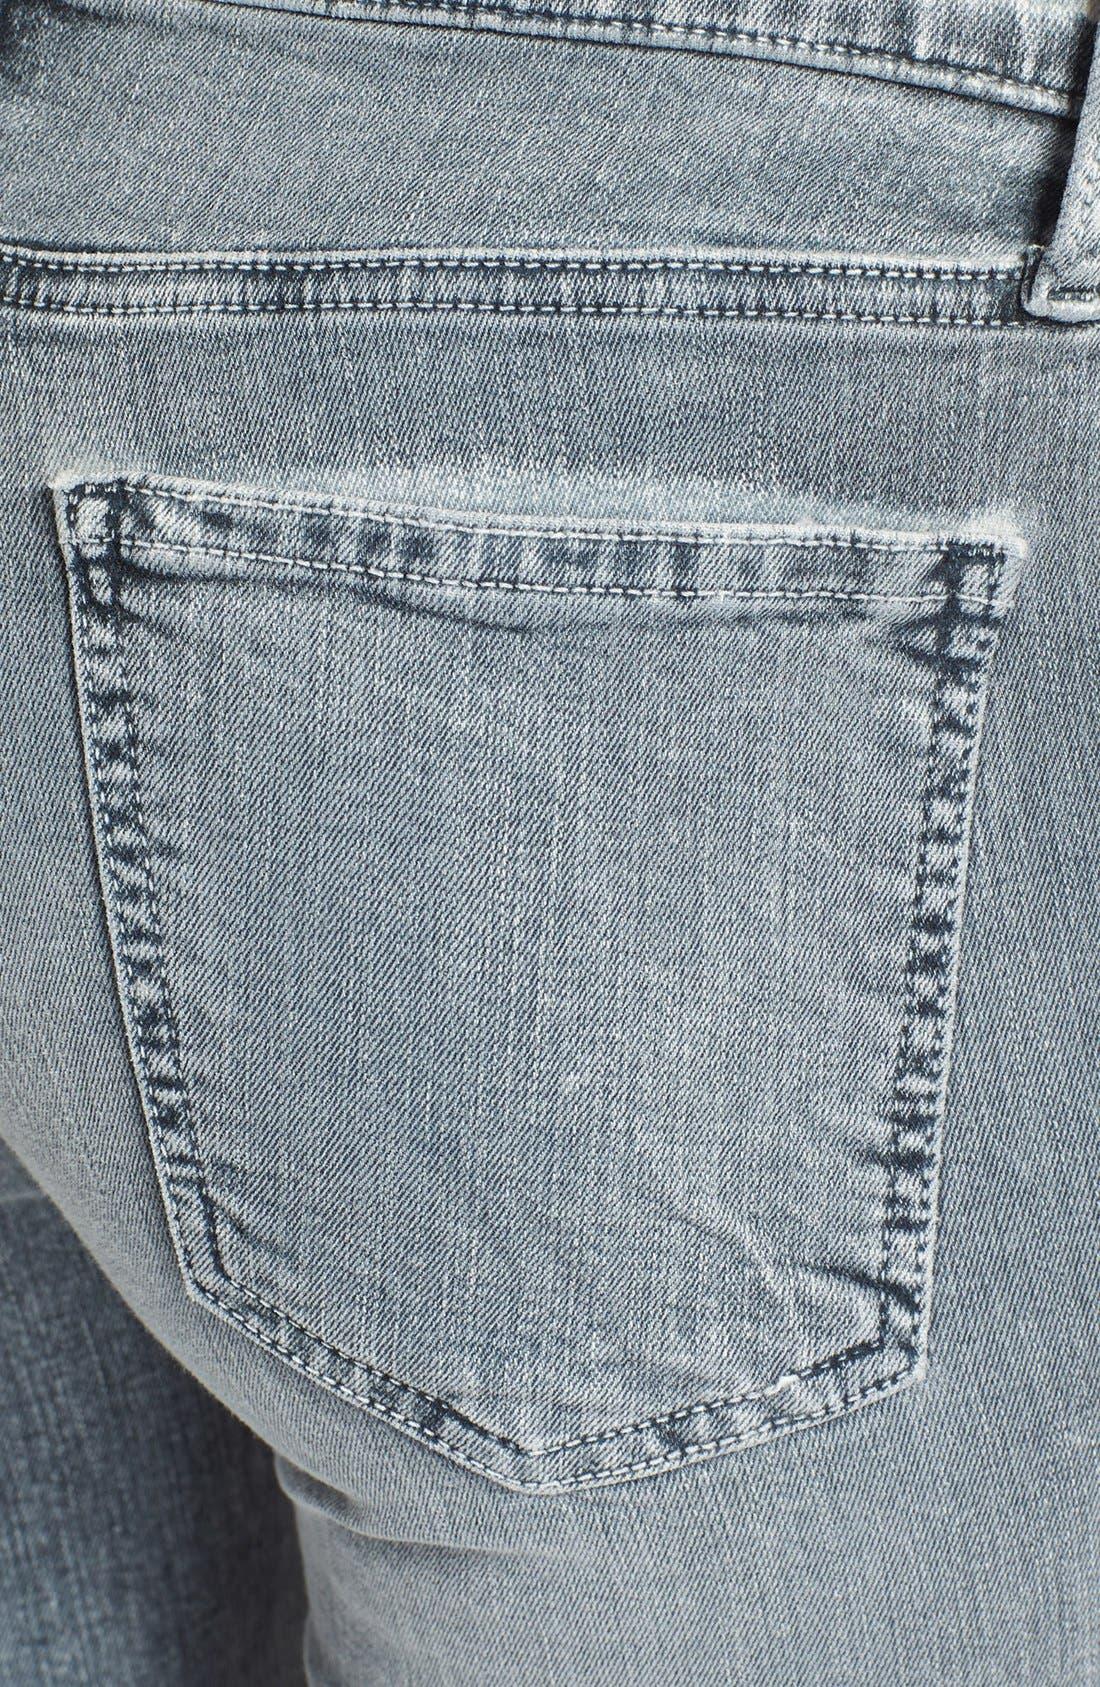 Alternate Image 3  - Current/Elliott 'The Soho' Zip Stiletto Skinny Jeans (Bleach Out Navy)